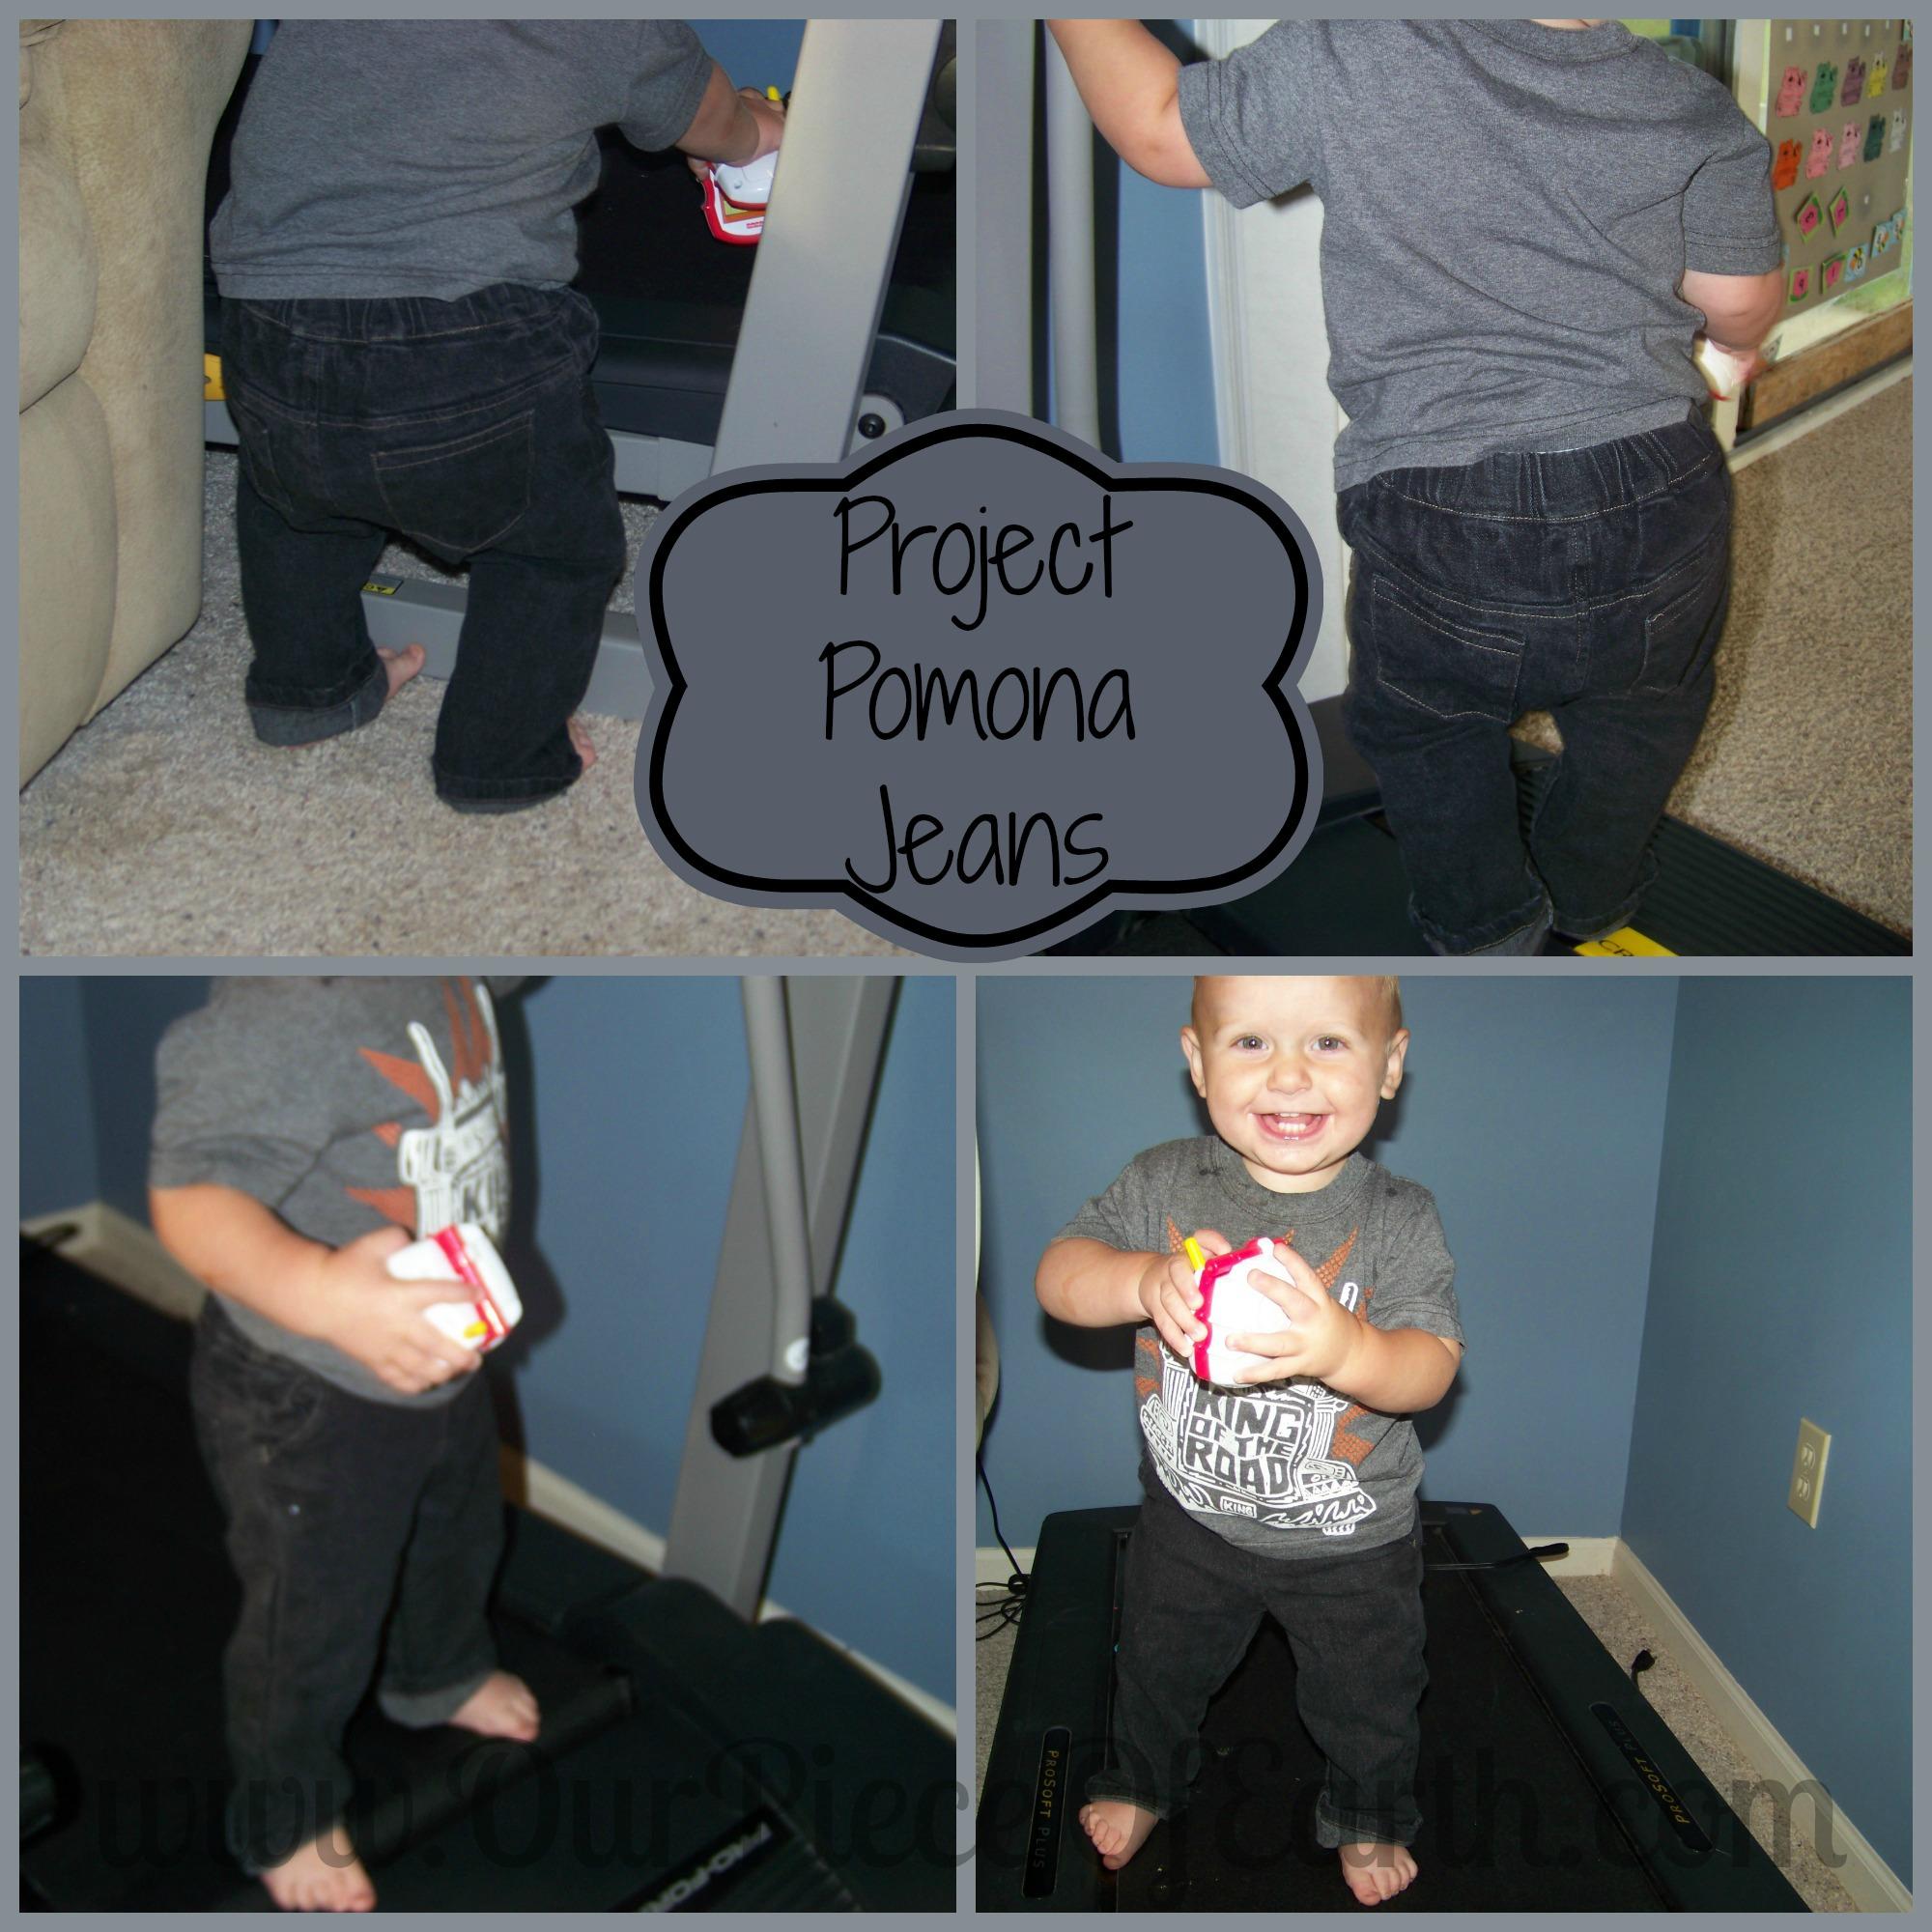 Project Pomona Jeans